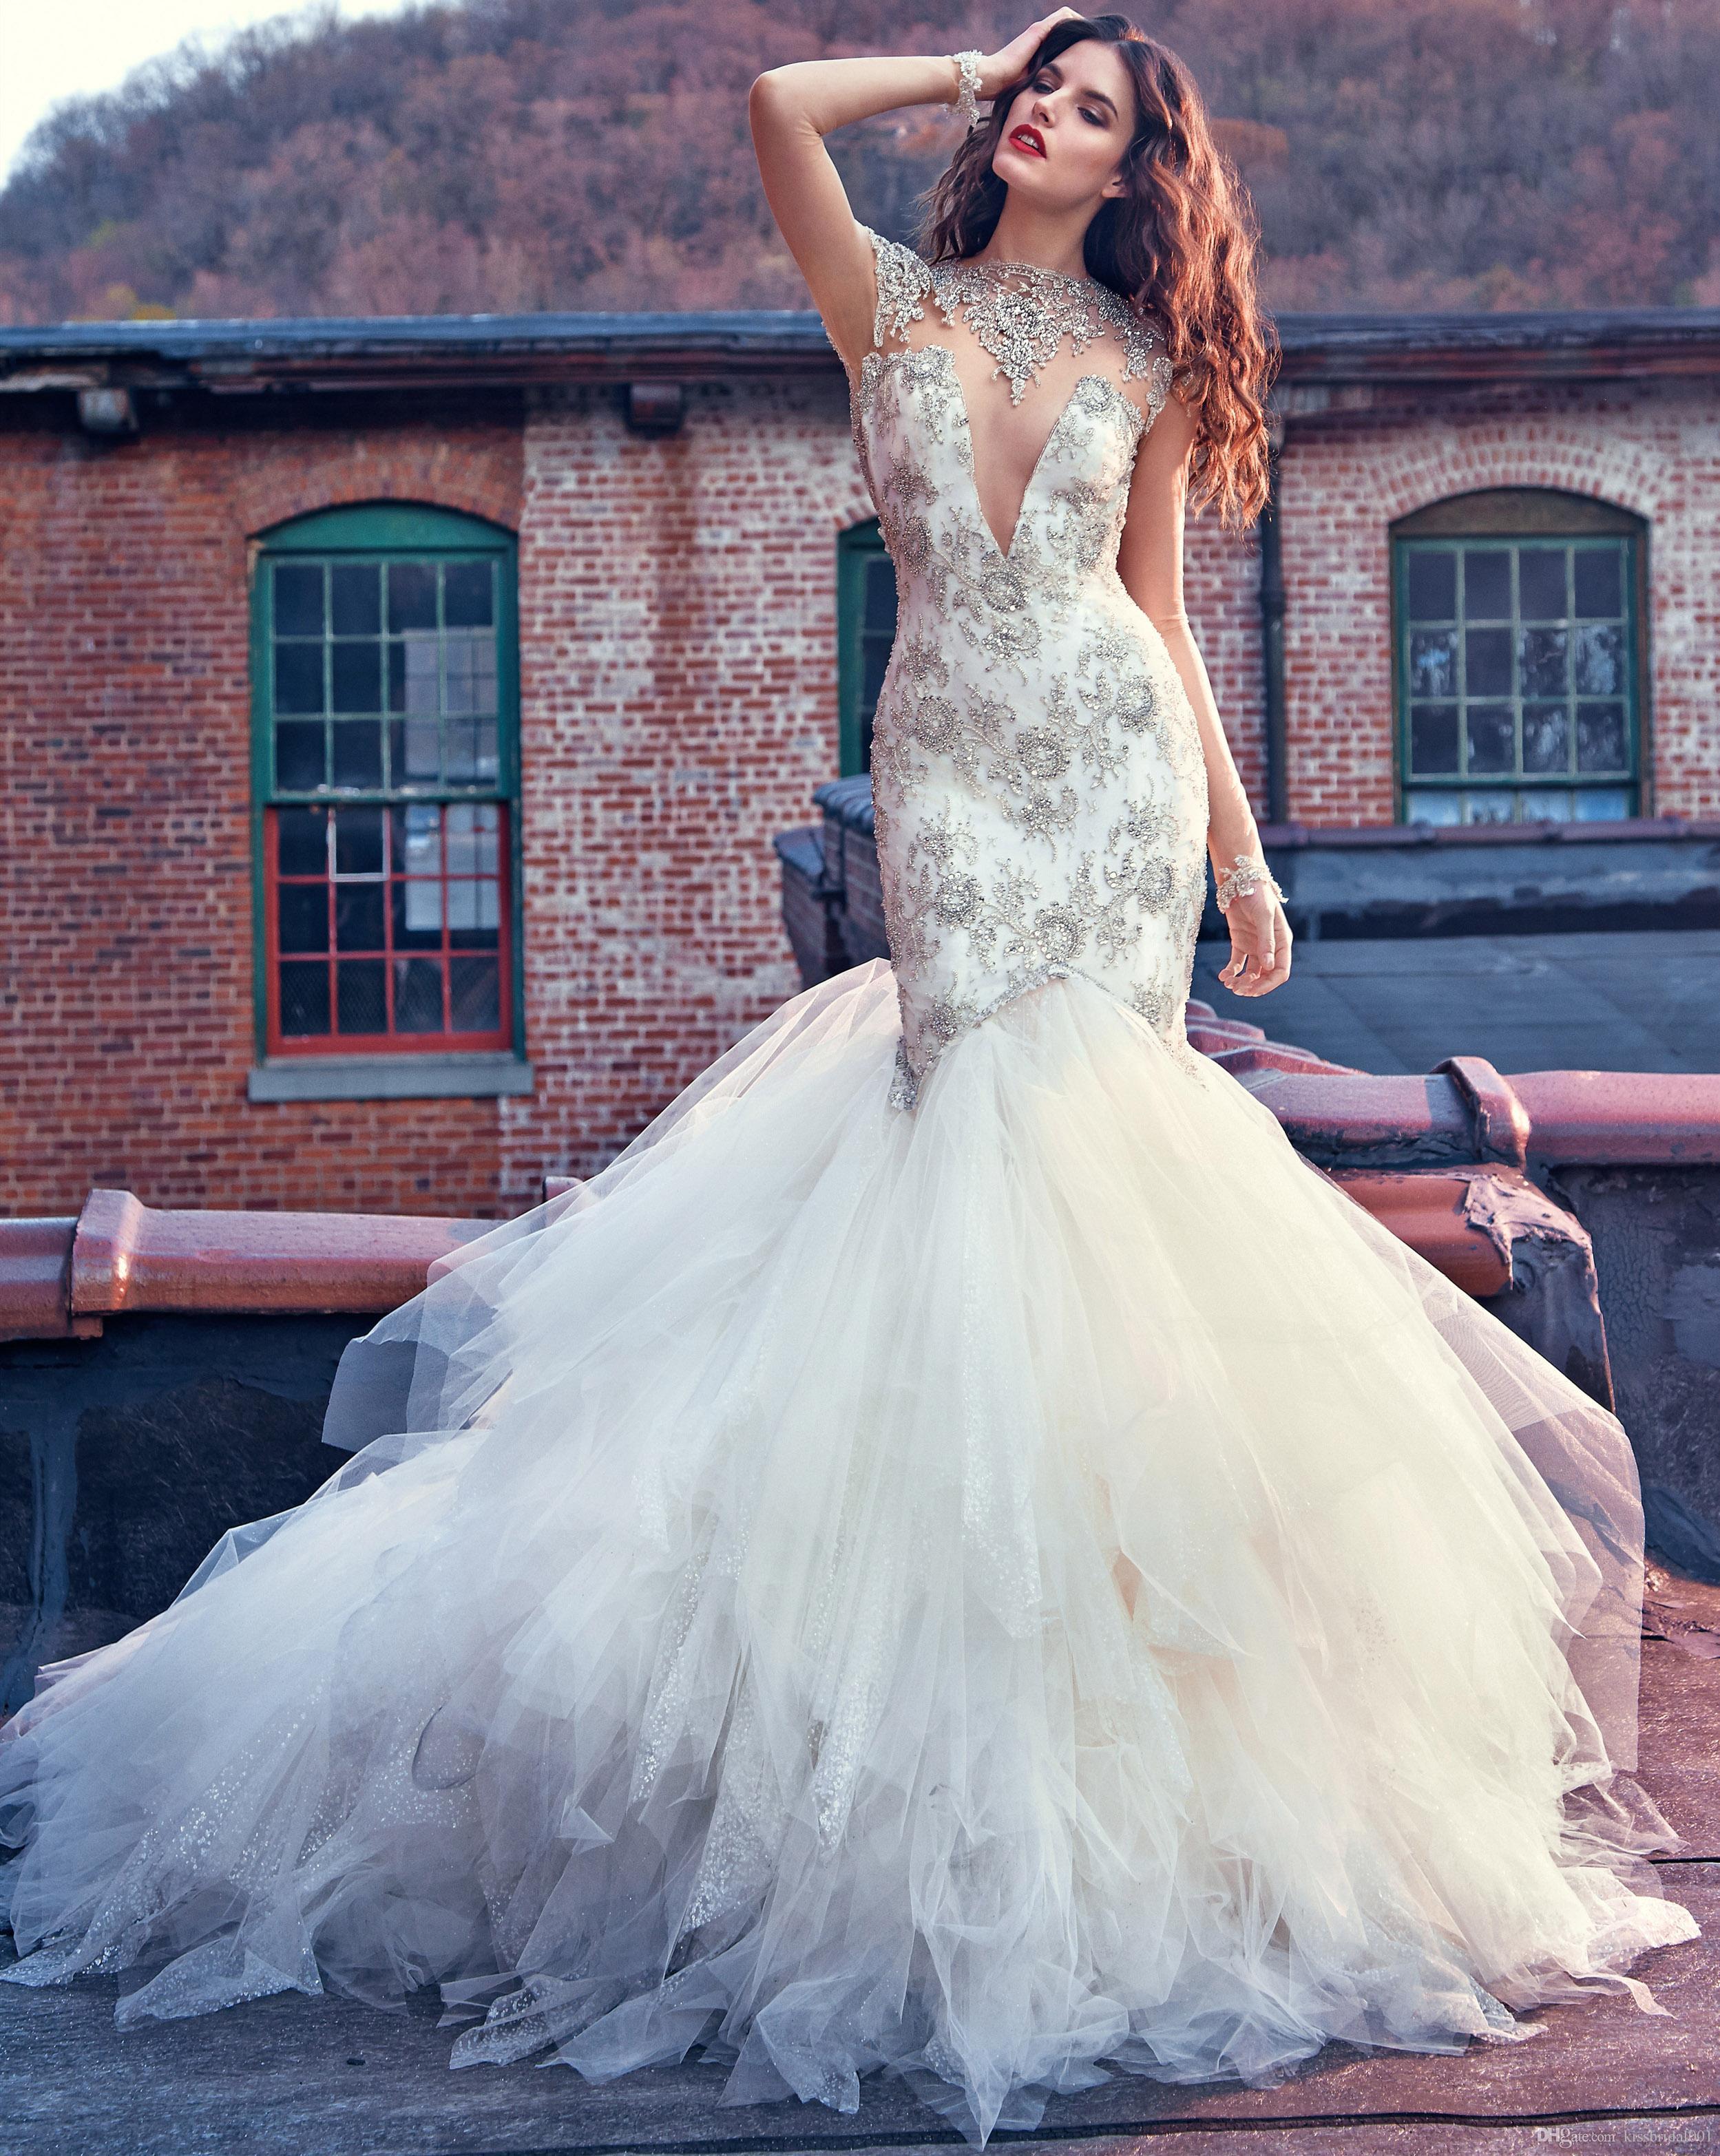 917b6a5e99 Luxury Wedding Dresses Vestido De Novia Sparkly Crystal Bead Mermaid  Wedding Dress Bridal Gowns Sheer Bodice Open Back Bride Formal Gown  Designer Mermaid ...